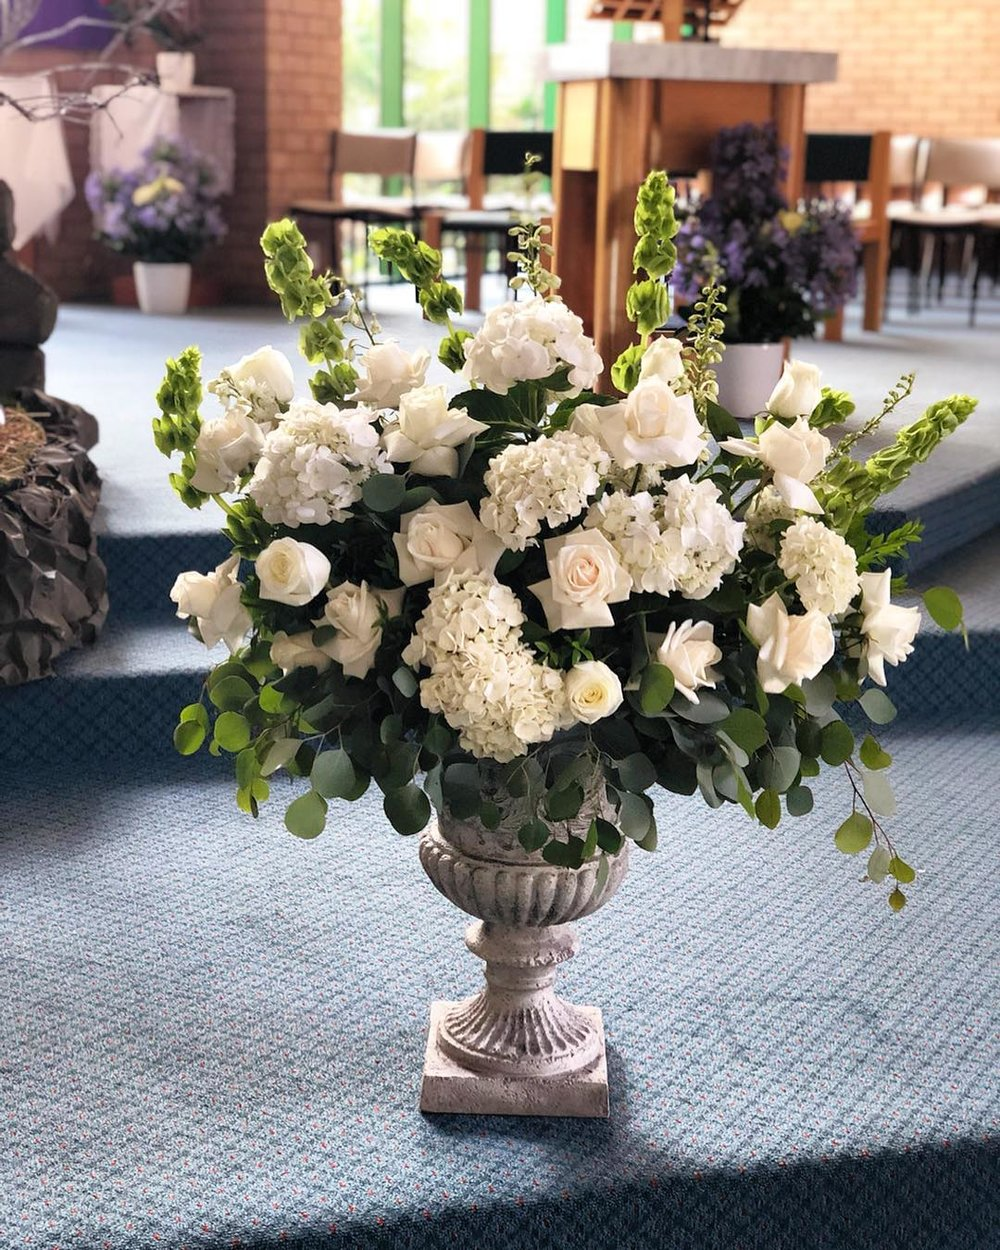 FLoral Ceremony arrangement in urn.jpg